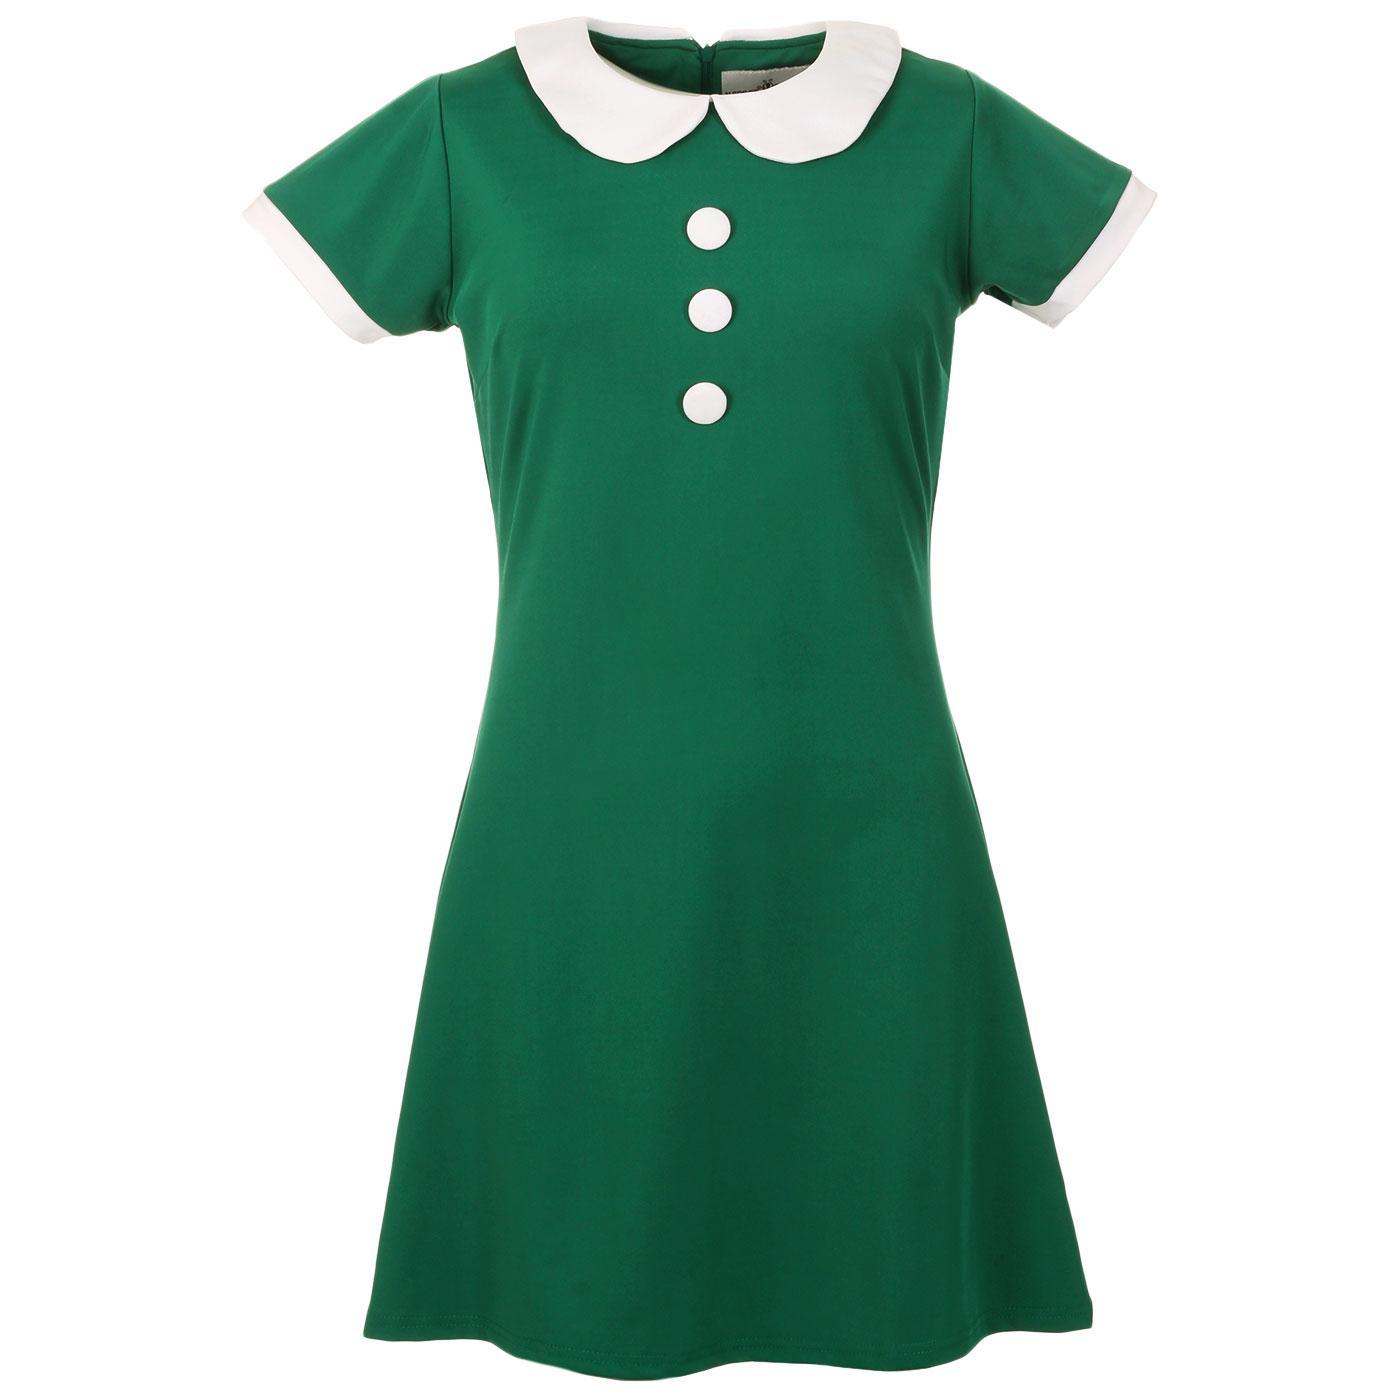 Dollierocker MADCAP ENGLAND 60s Mod Dress (Teal)